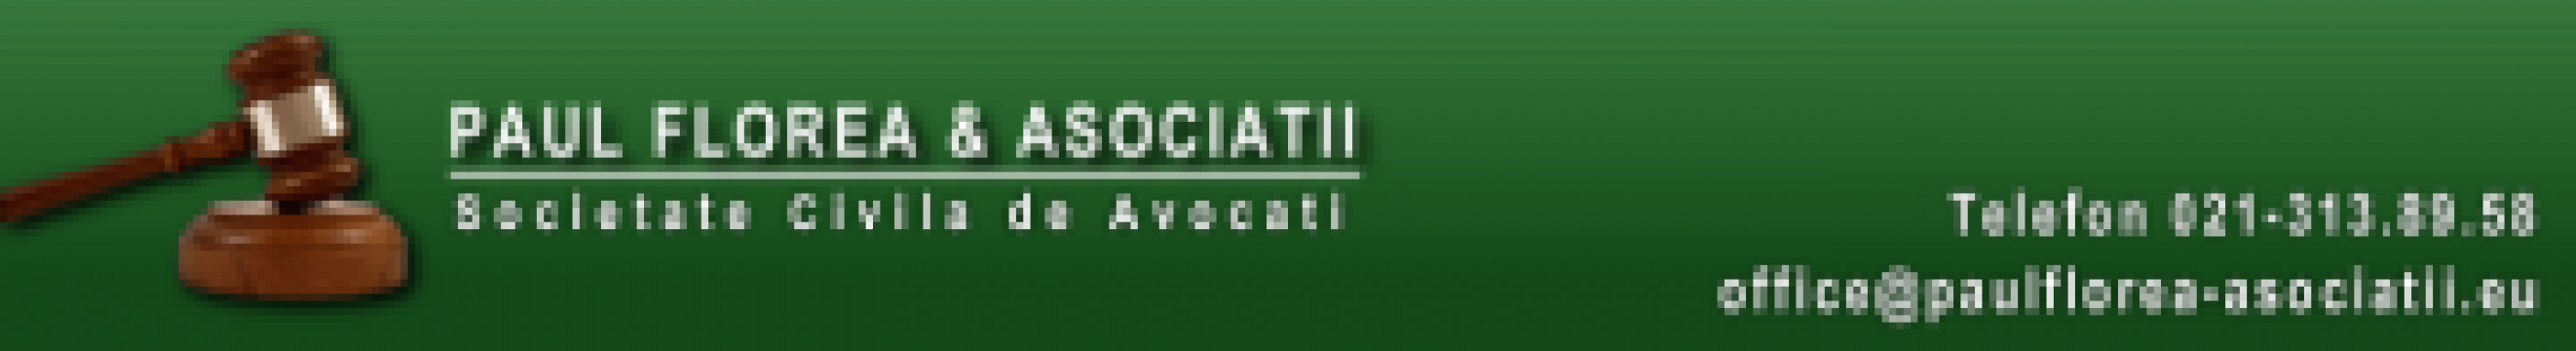 Inregistrare/ modificare/ dizolvare/ lichidare firma de la Societate Civila De Avocati Paul Florea & Asociatii